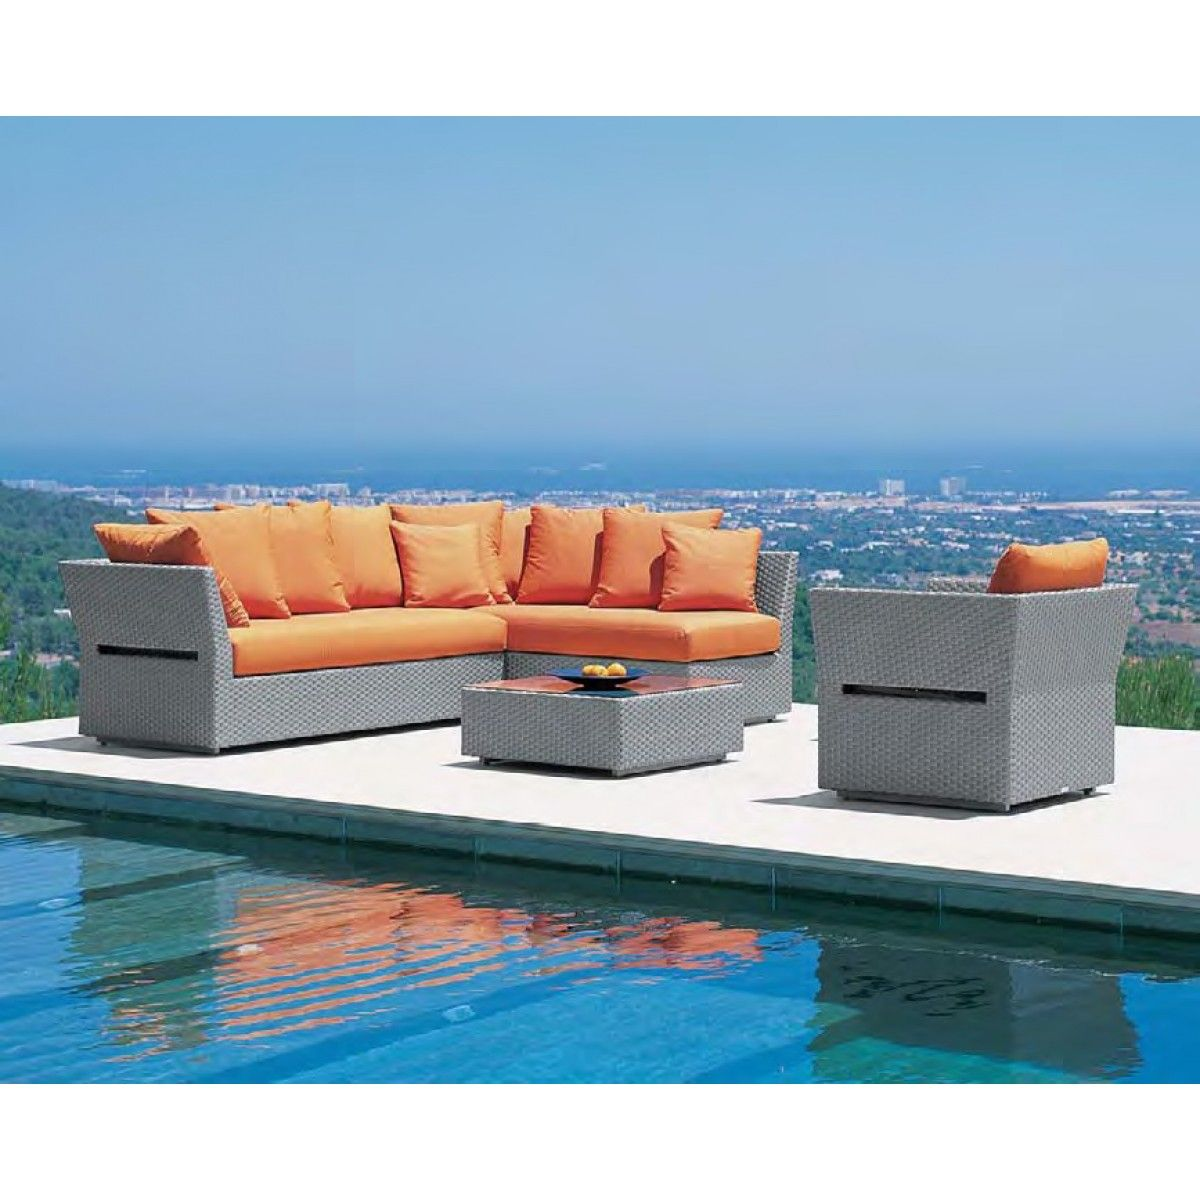 ** Clearance ** : Rausch Seaside Lounge Set Ex Display # ...